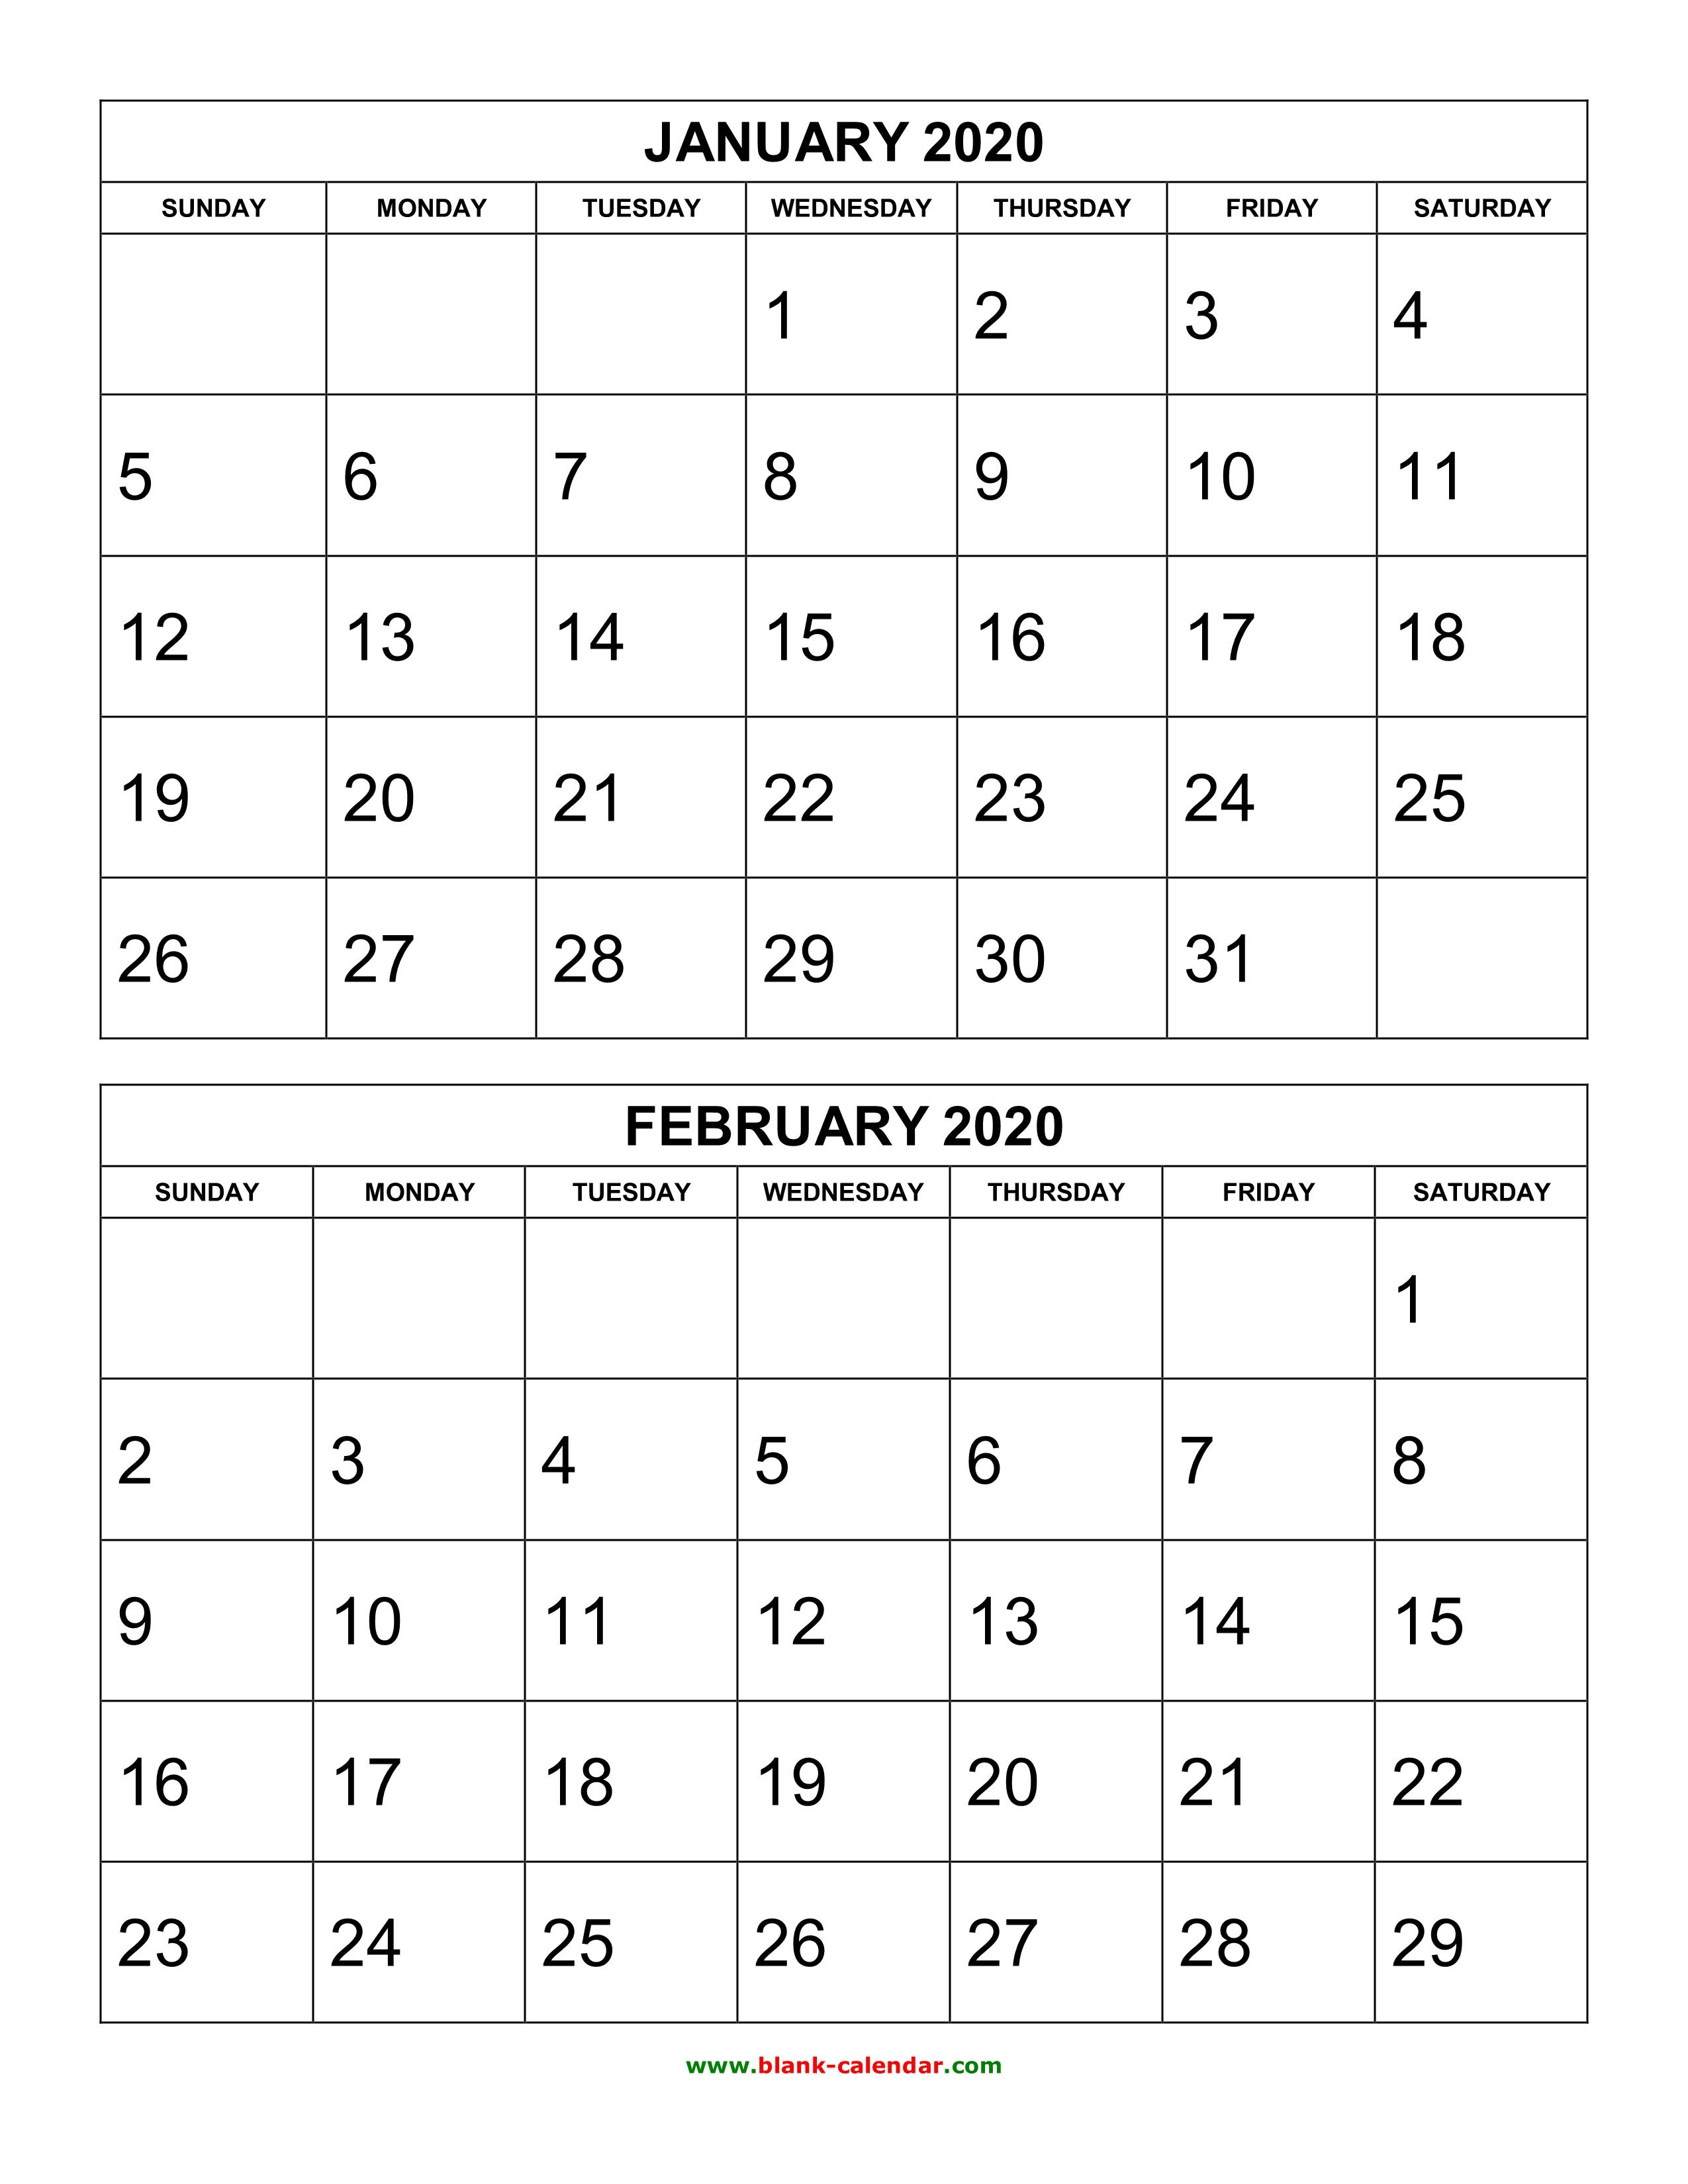 Free Download Printable Calendar 2020, 2 Months Per Page, 6 Pages regarding Free Printable 2019-2020 Calendar With Editing